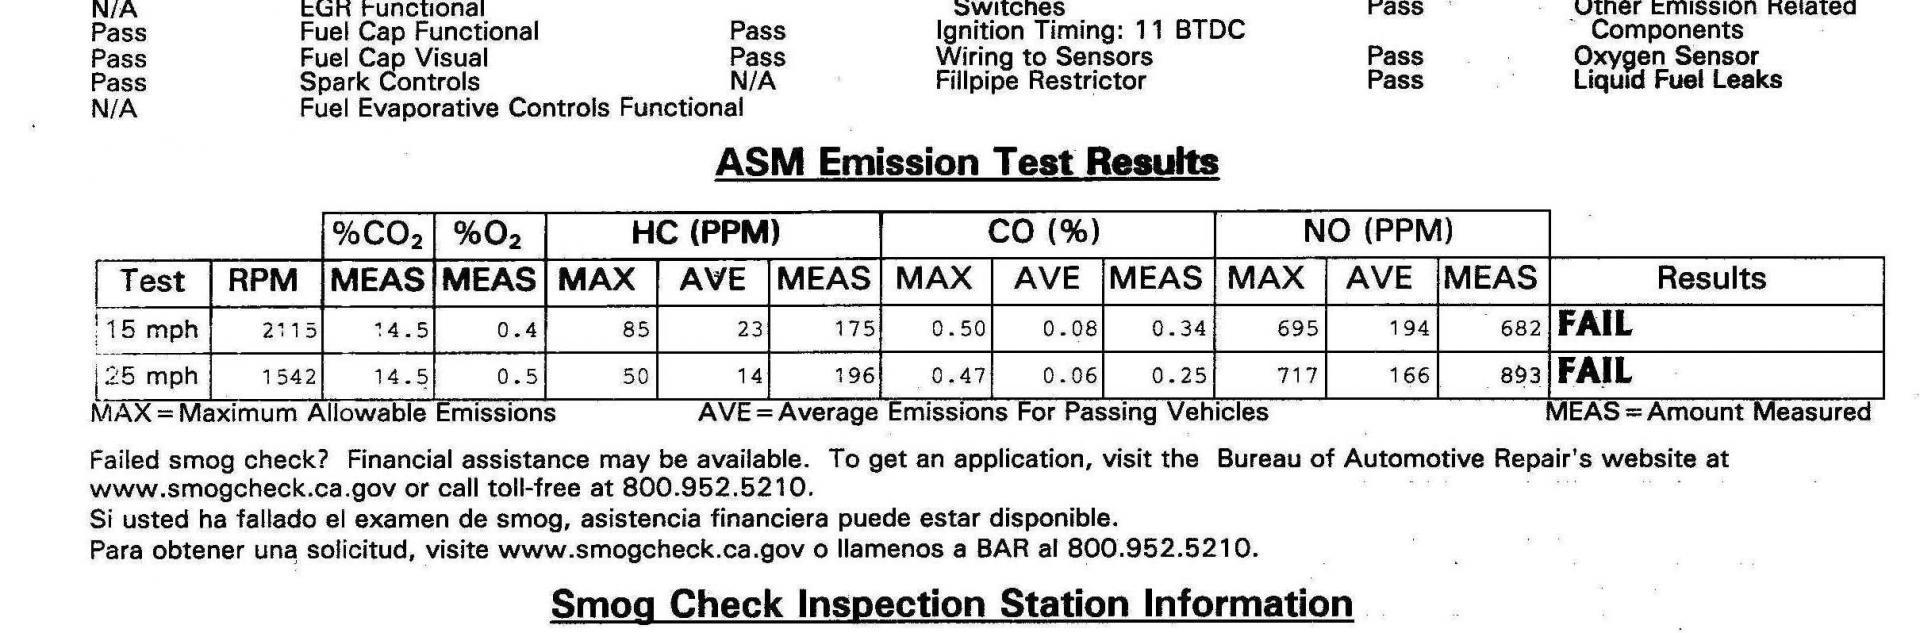 high HC emissions problem-img240-r1.jpg